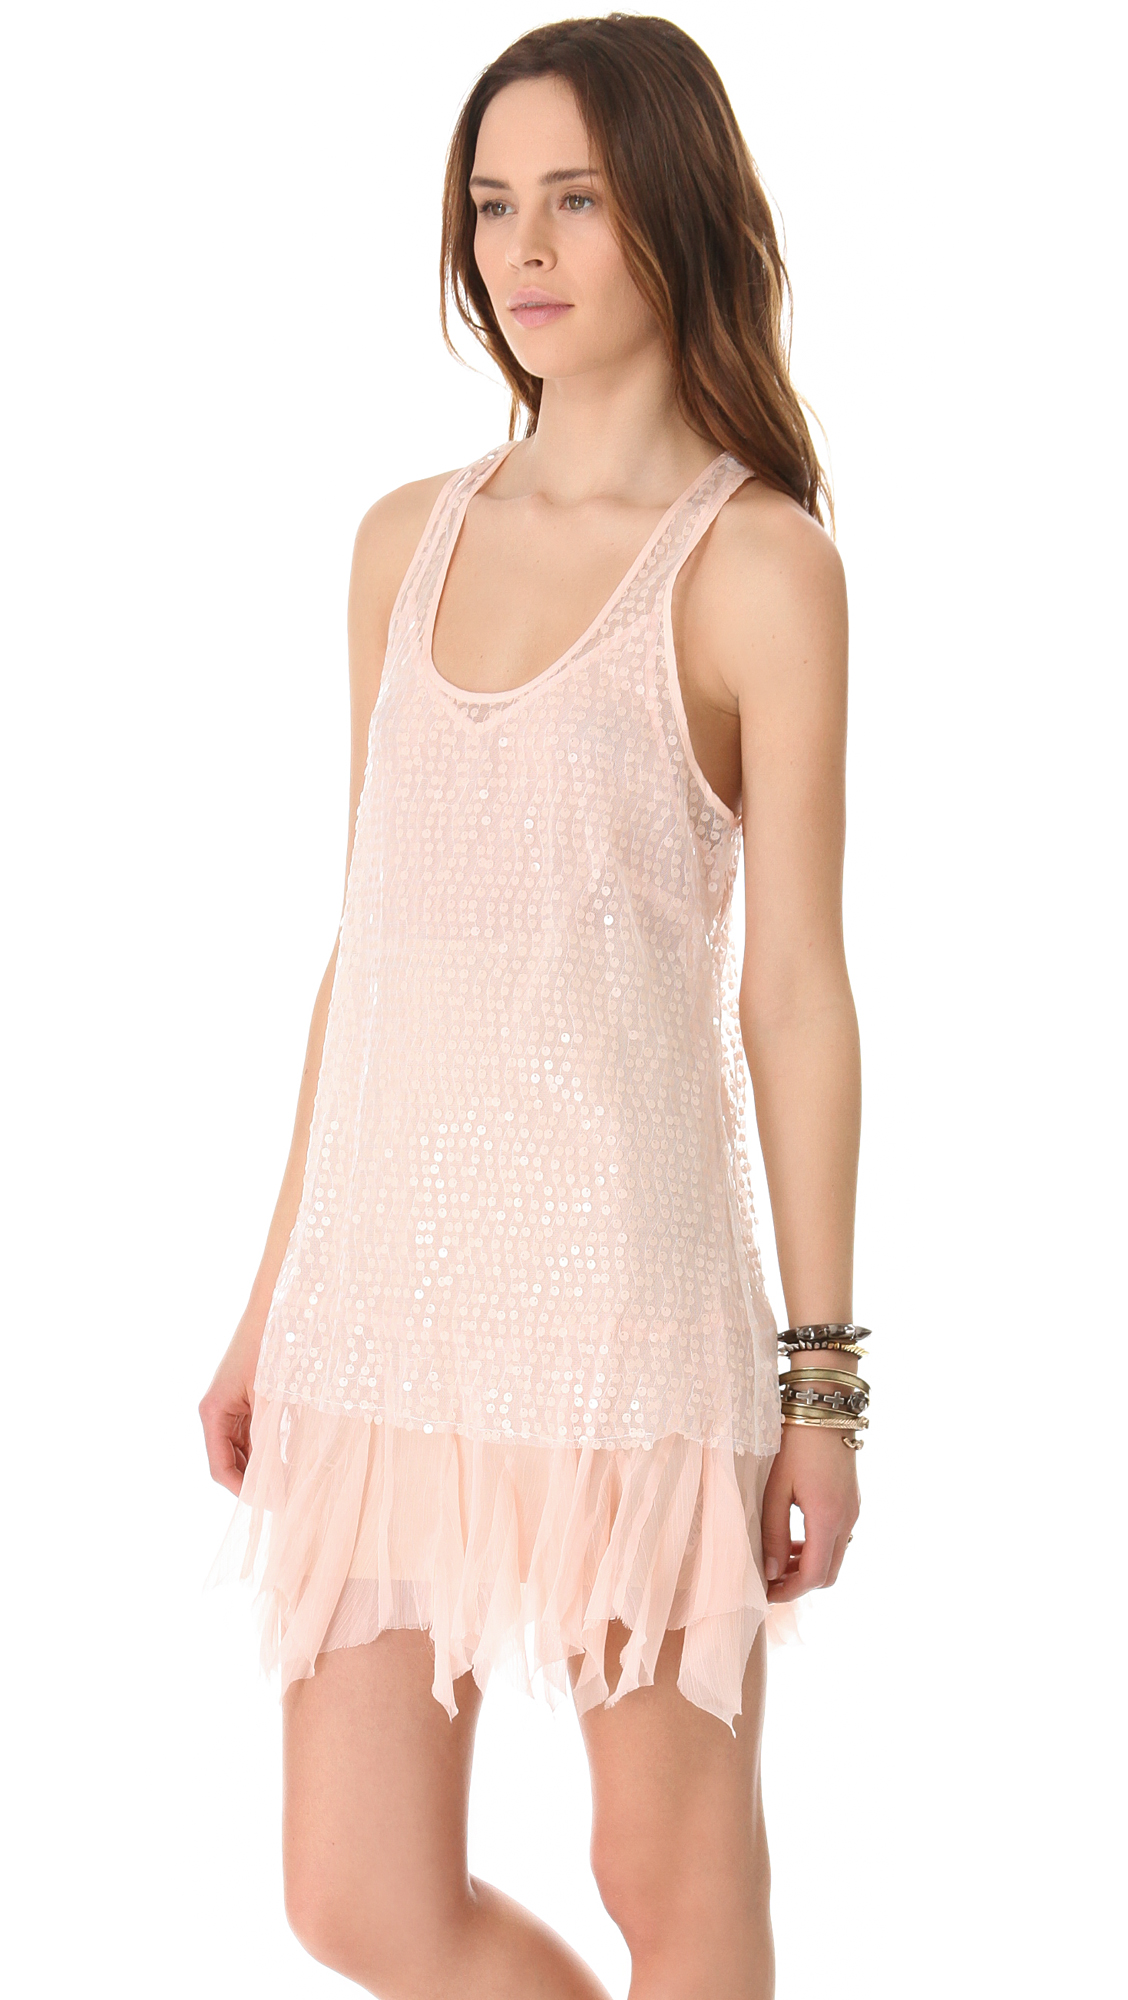 Free People Sequin Slip Dress in Pink - Lyst